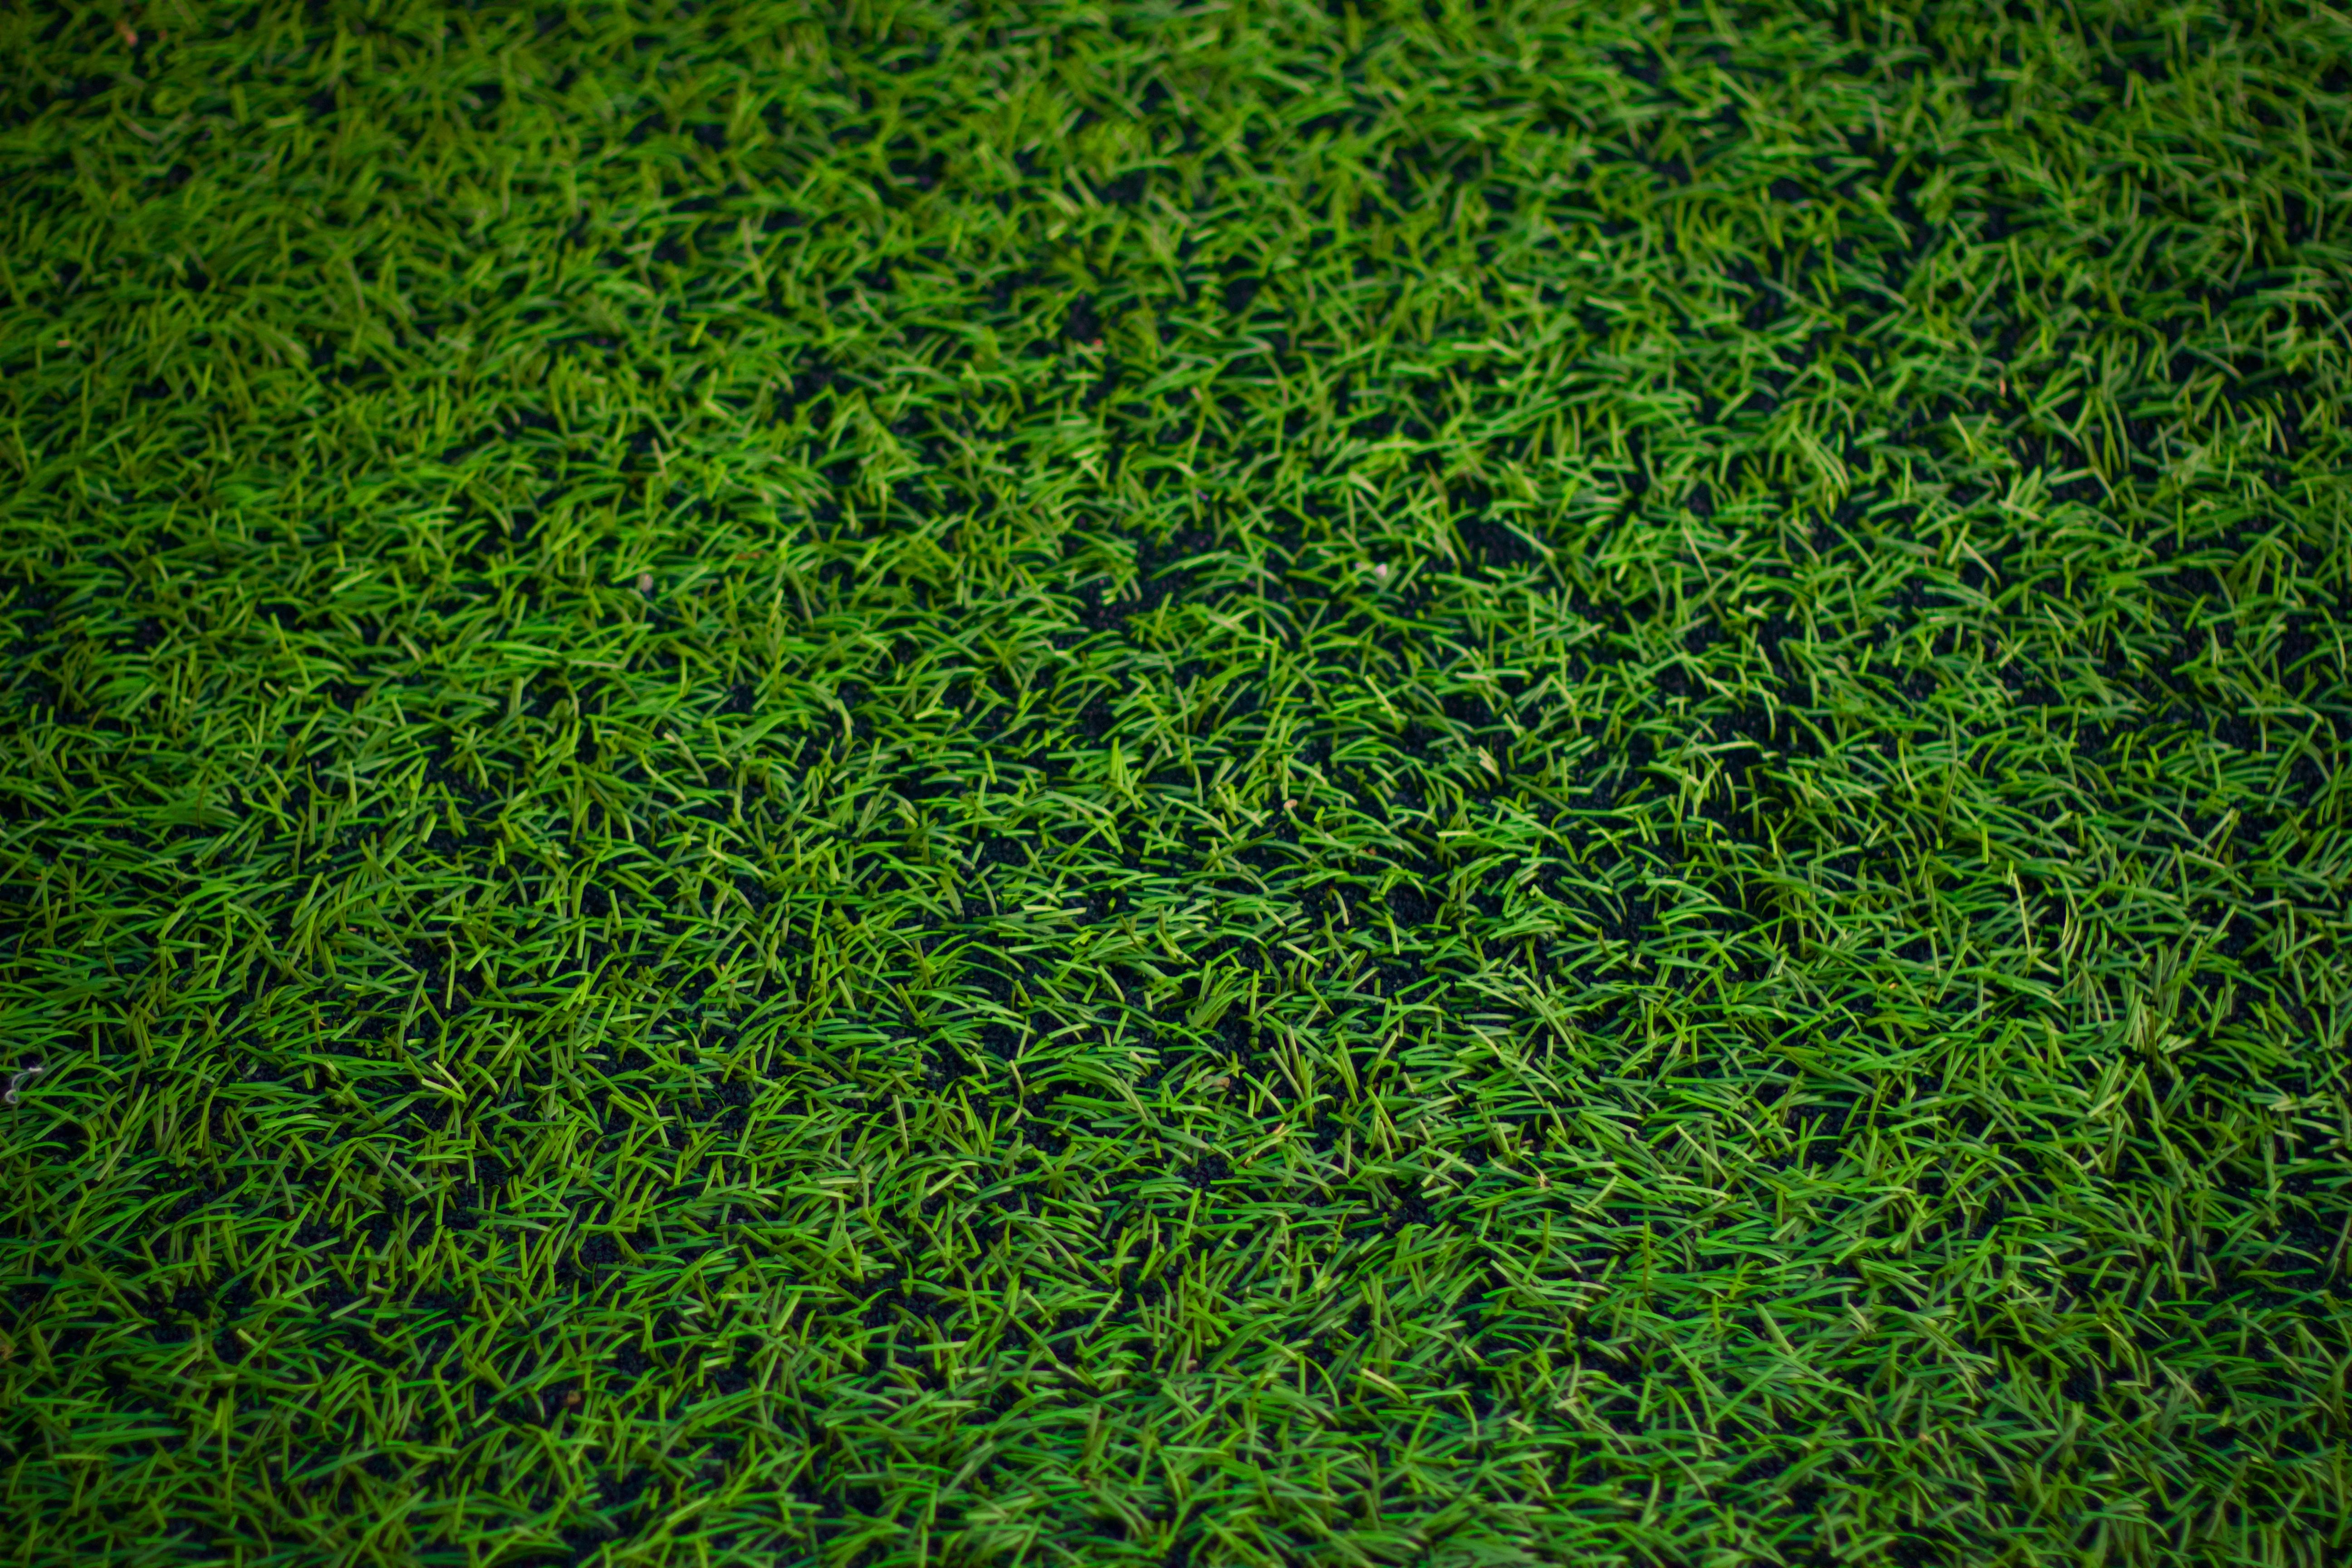 images gratuites herbe plante champ pelouse feuille. Black Bedroom Furniture Sets. Home Design Ideas